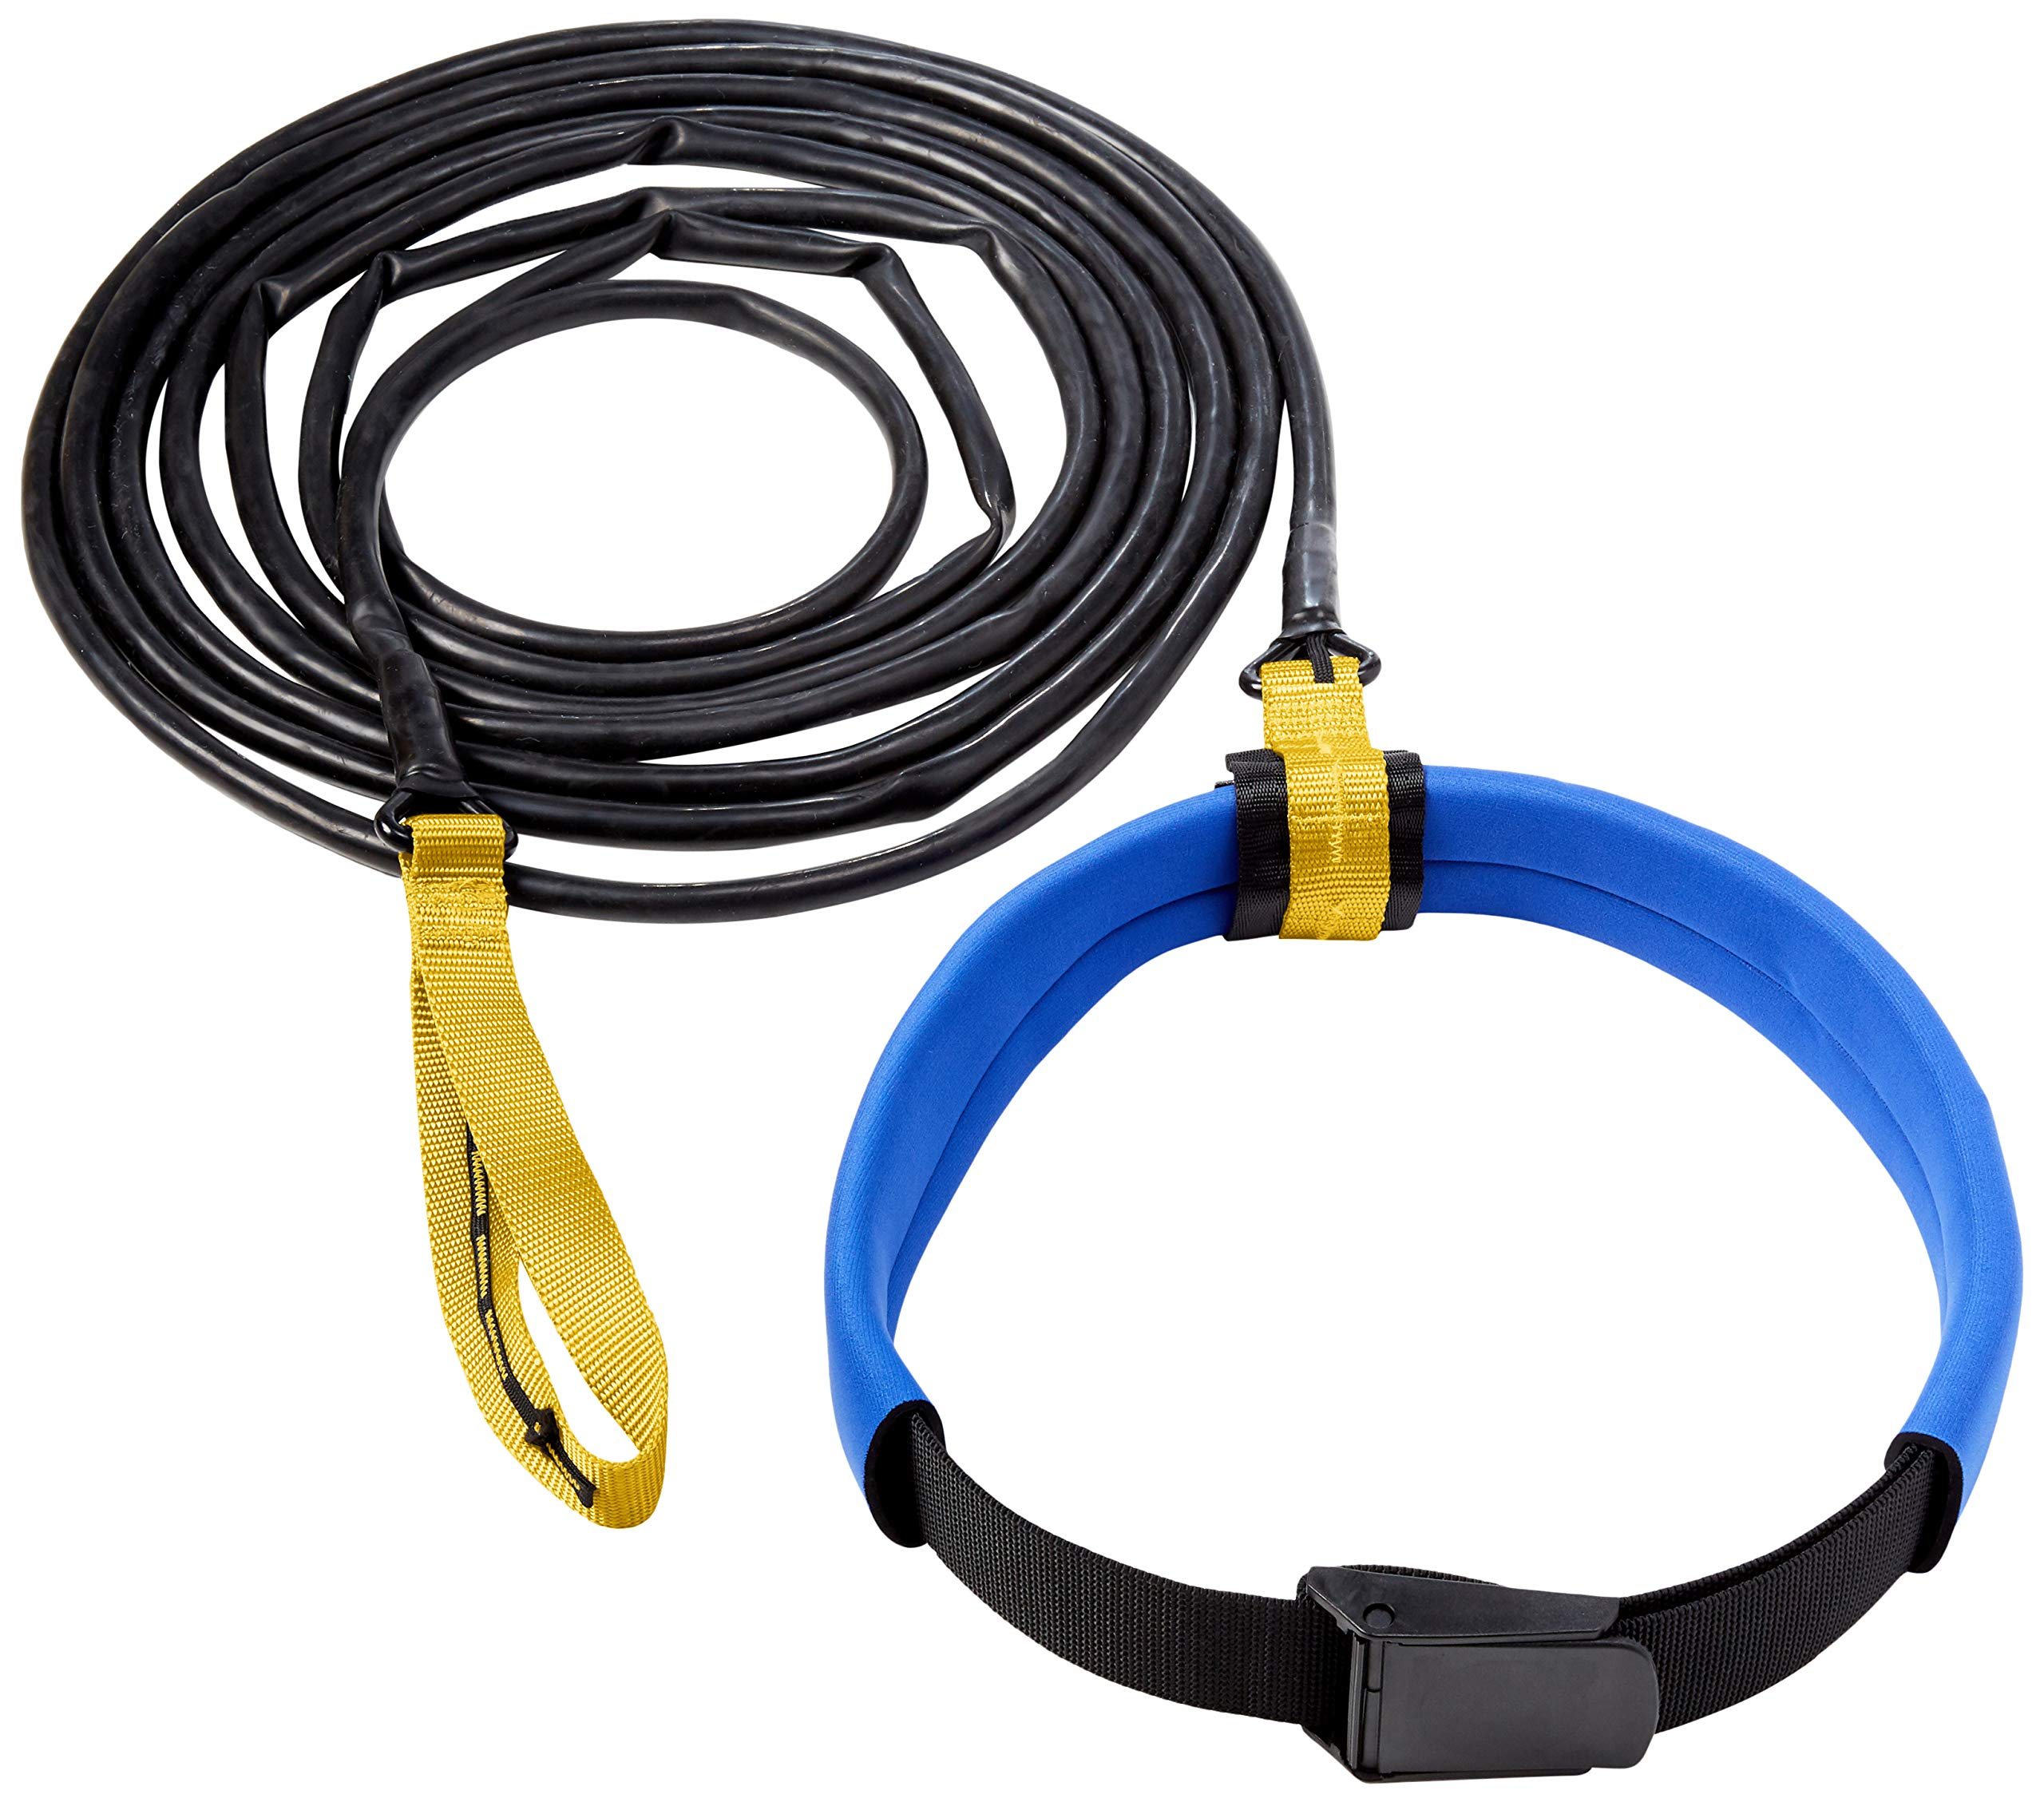 StretchCordz Long Belt Slider, Yellow Strap Handle